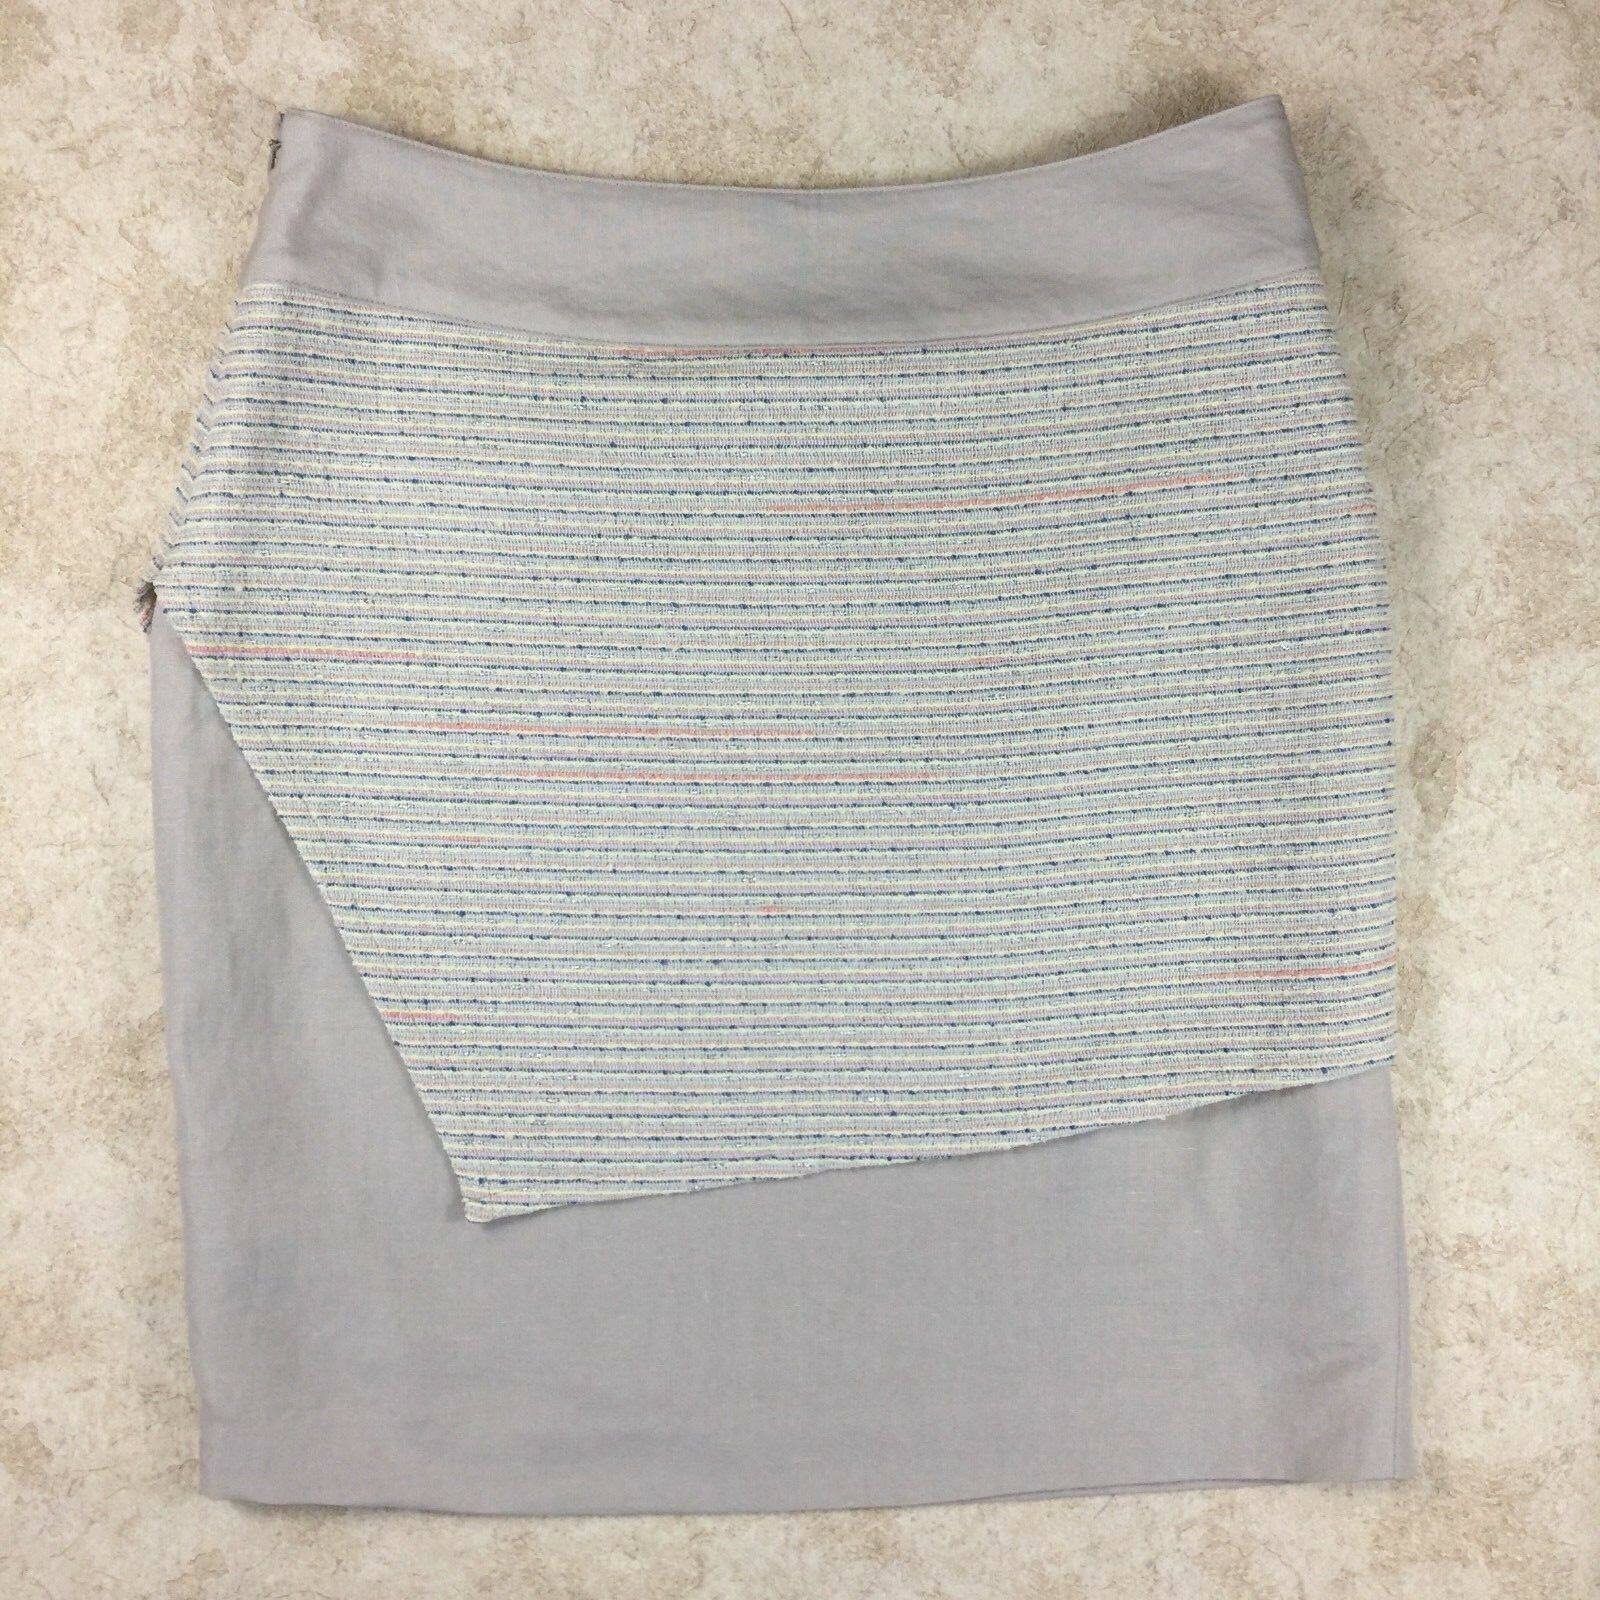 Cocoon by Elizabeth Geisler Fulton Layered Skirt, Size 6 NWT